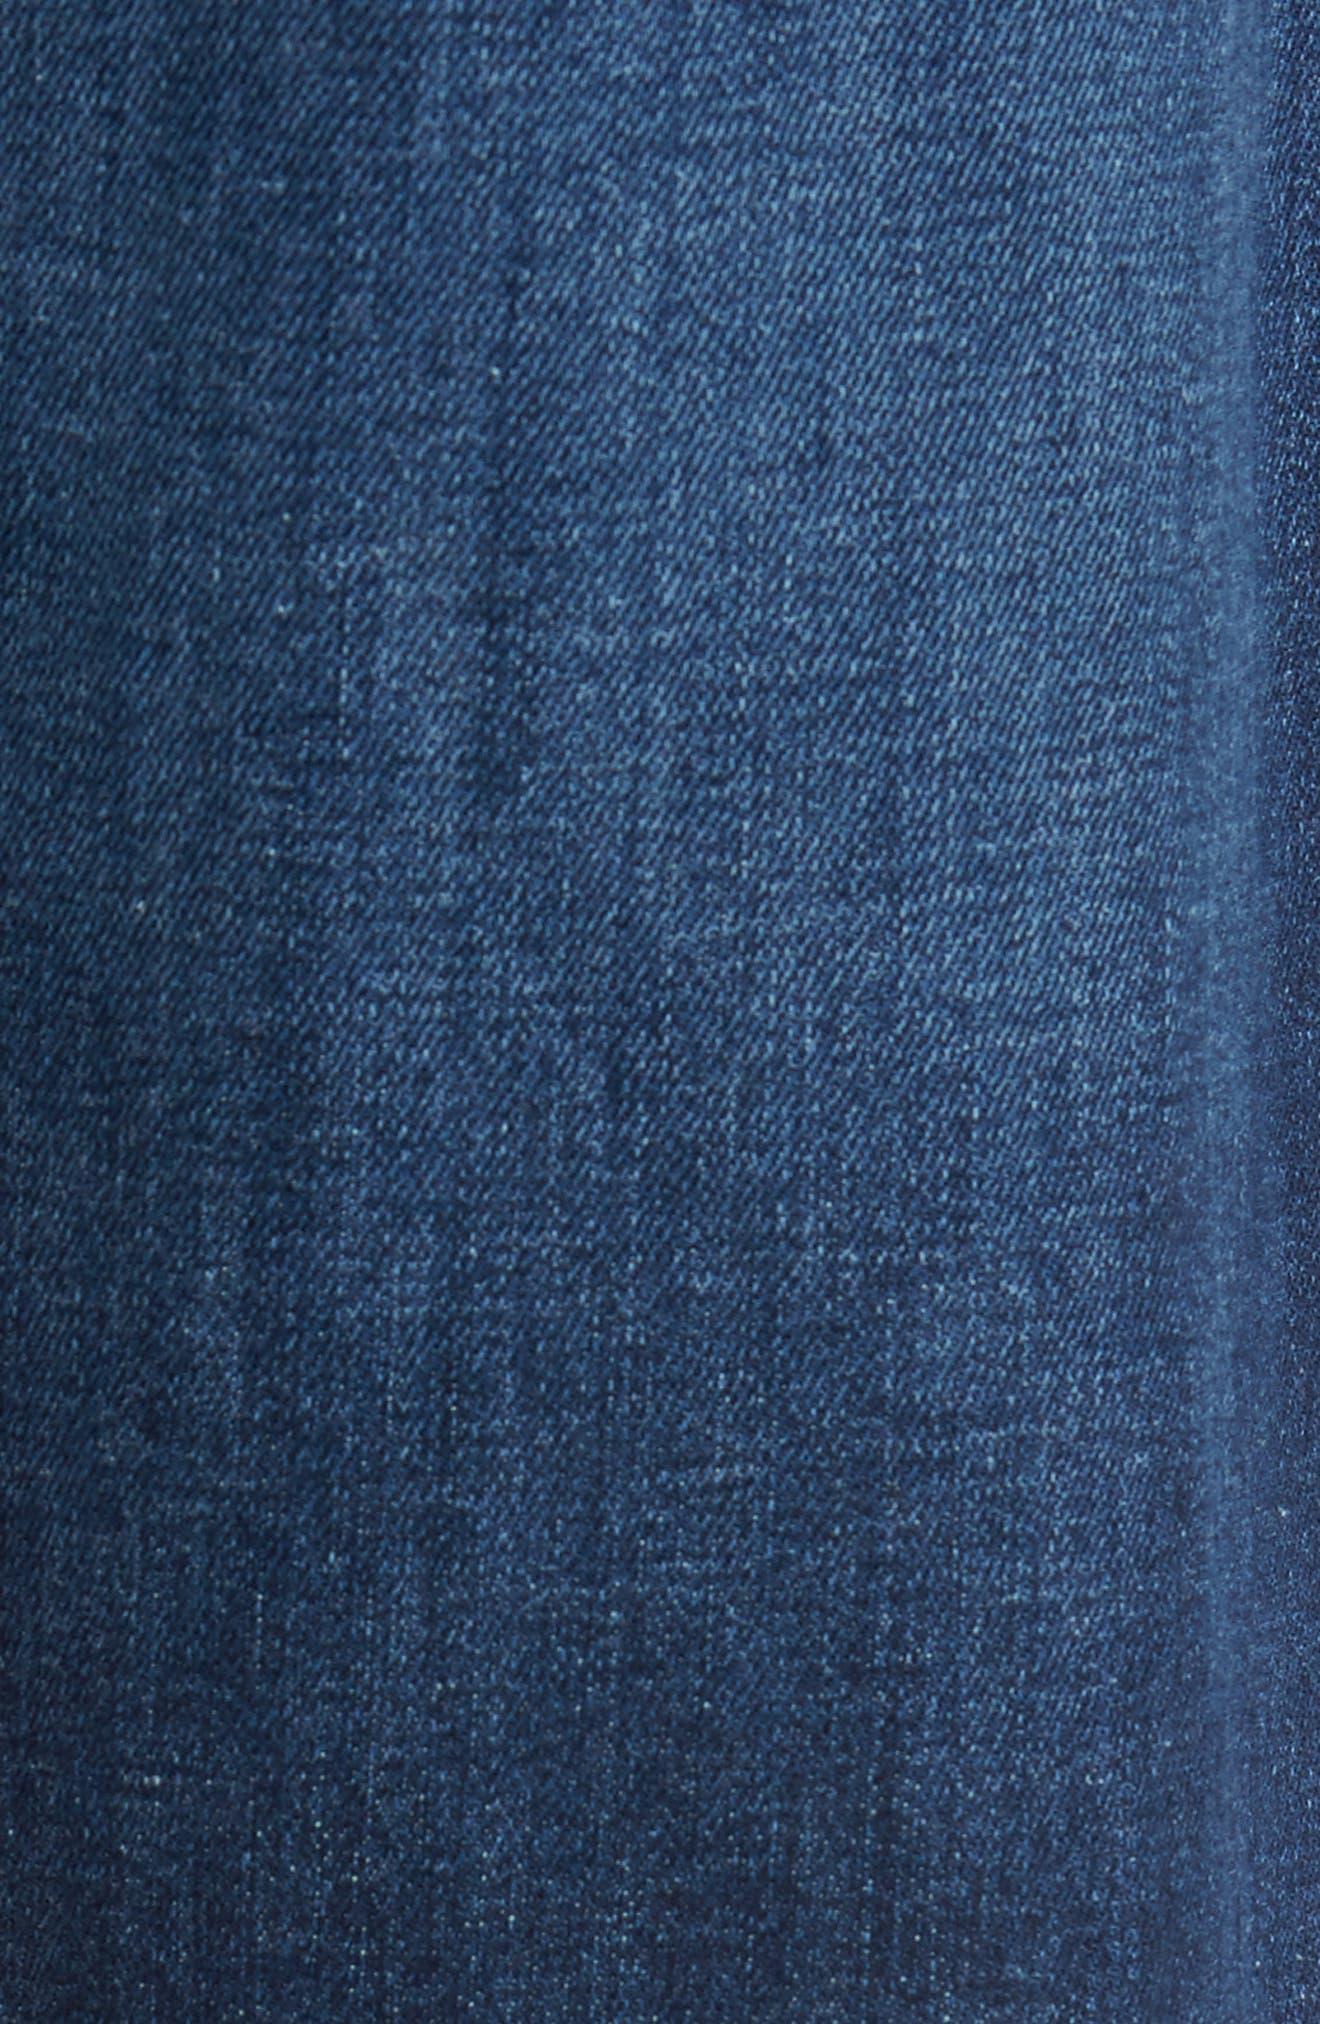 Brixton Slim Straight Leg Jeans,                             Alternate thumbnail 5, color,                             Bradlee